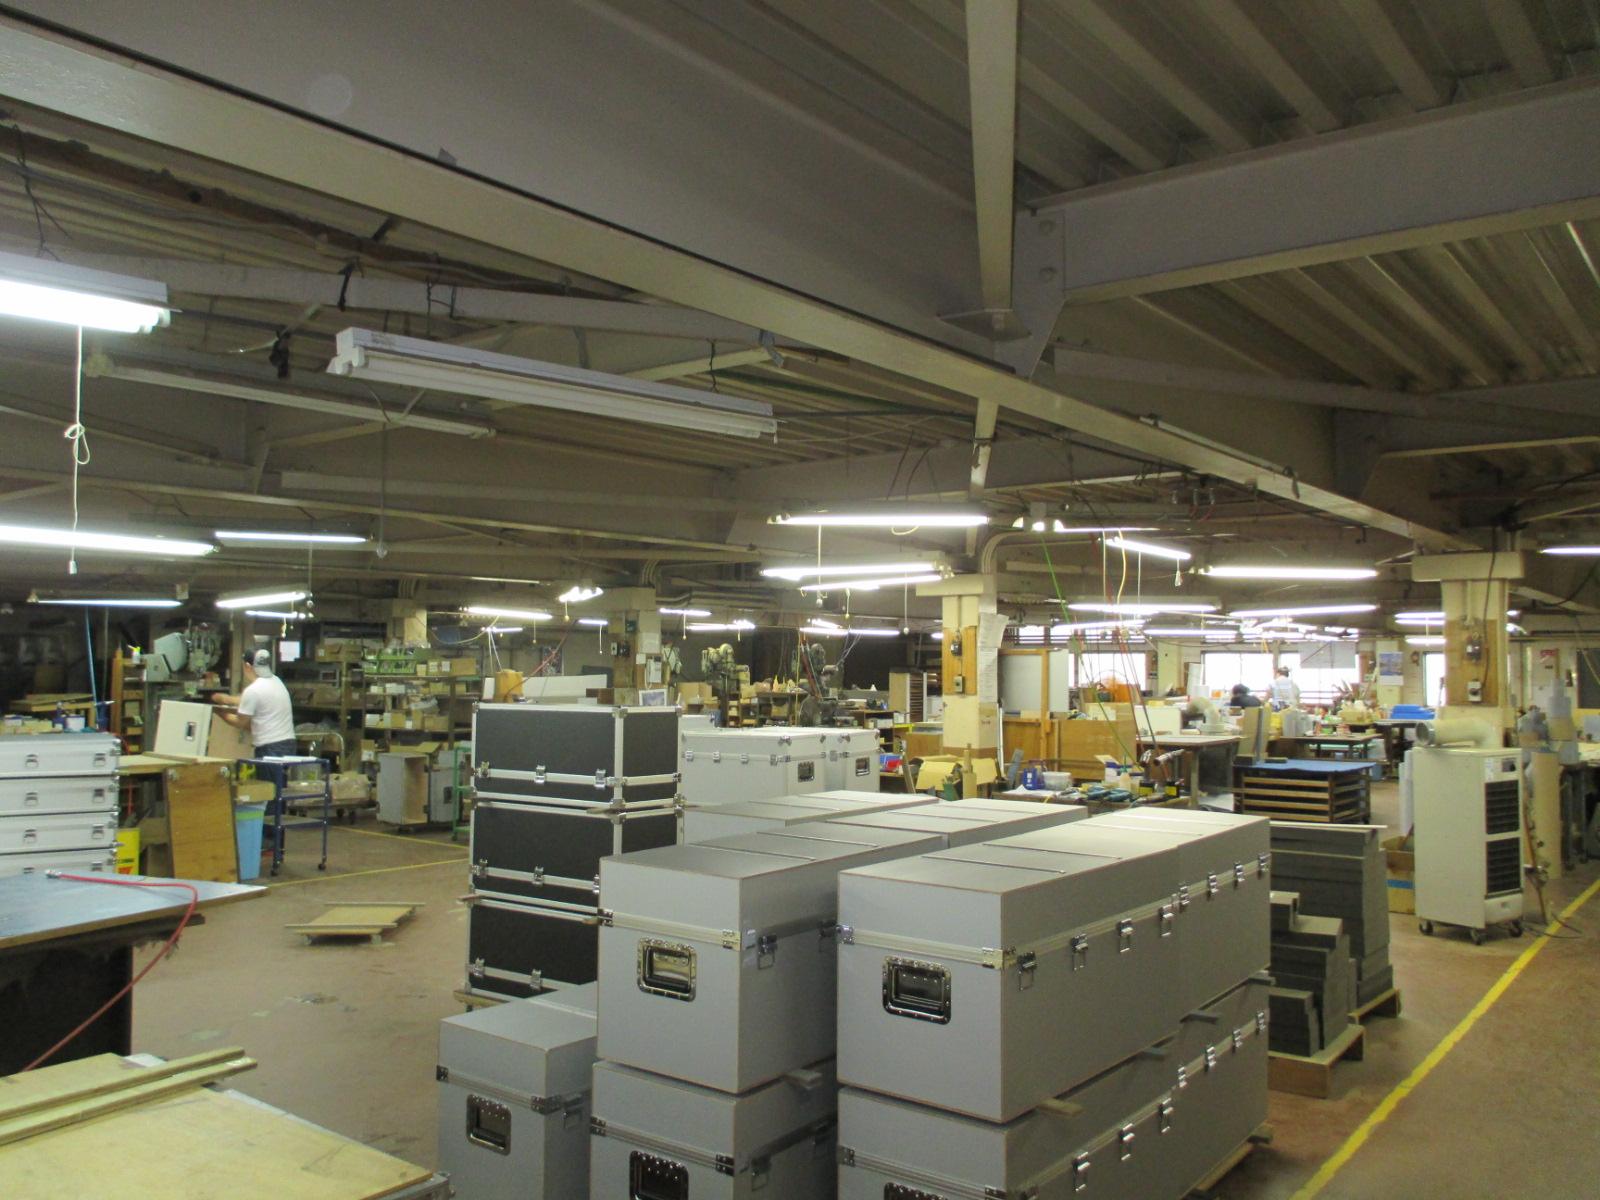 3Fアルミケース製造部